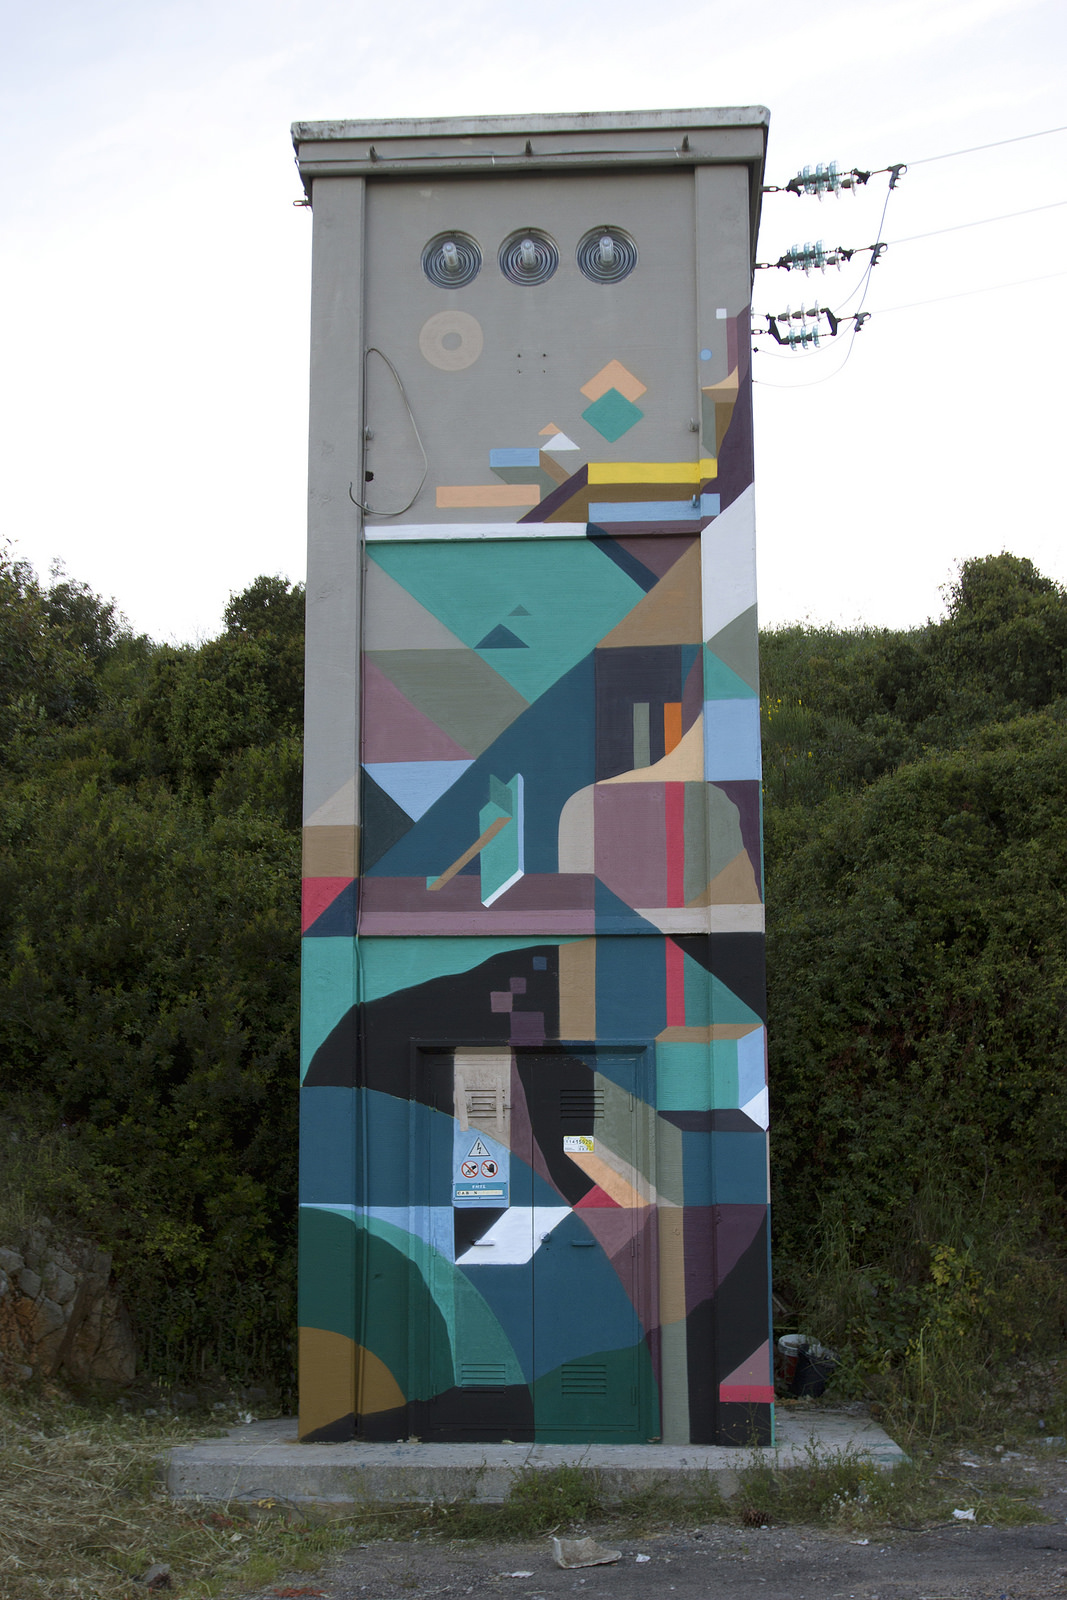 nelio-new-murals-for-memorie-urbane-festival-2014-07